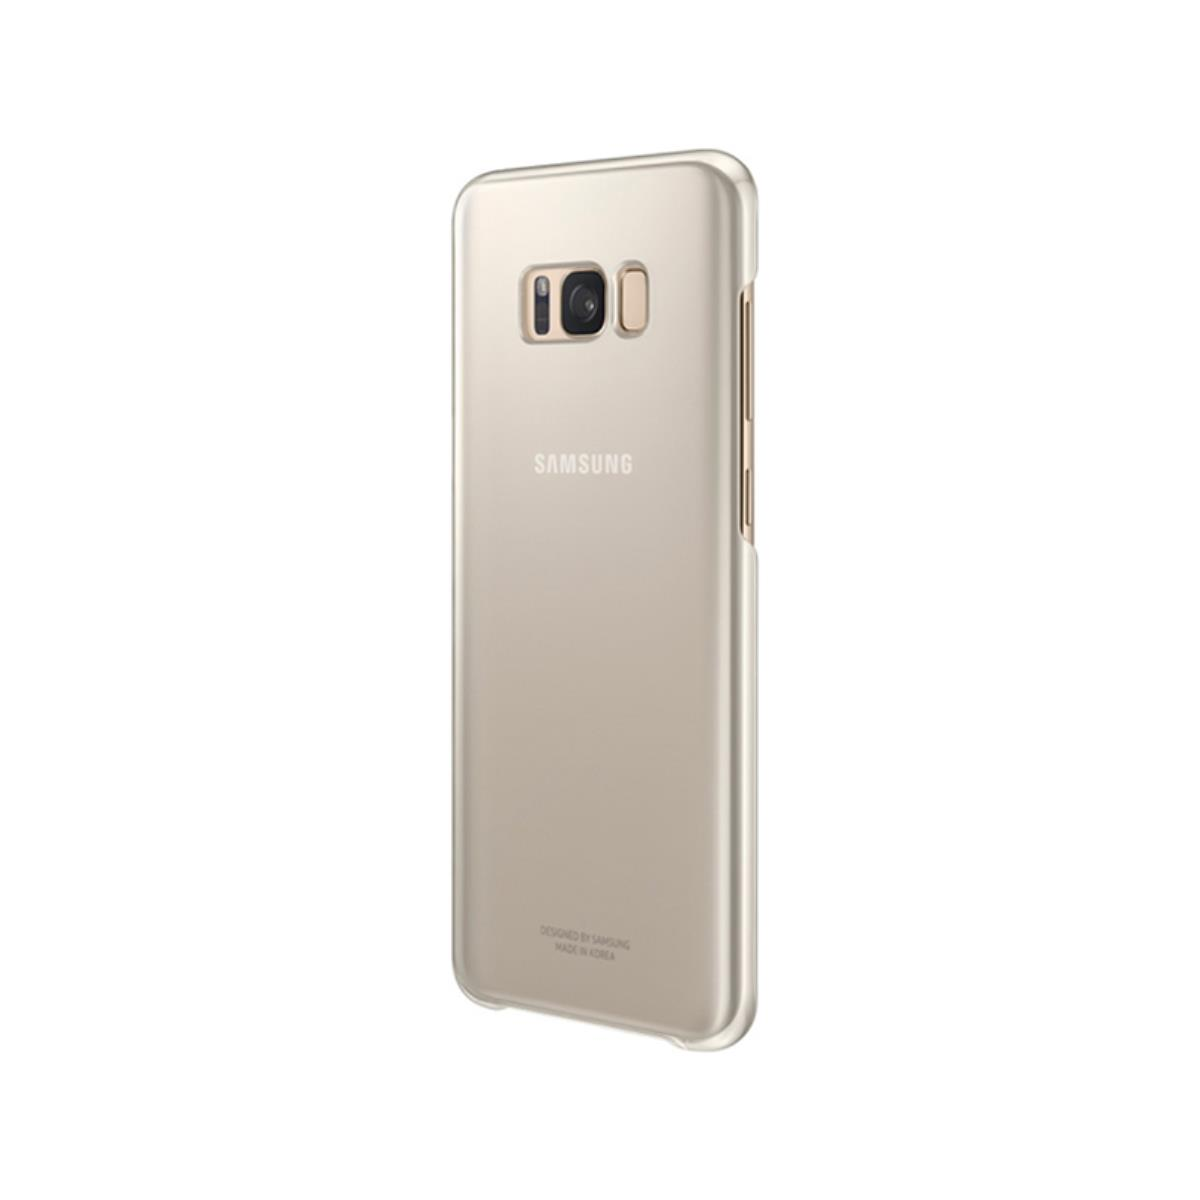 IPHONE 6S 16GB SPACE GREY USADO